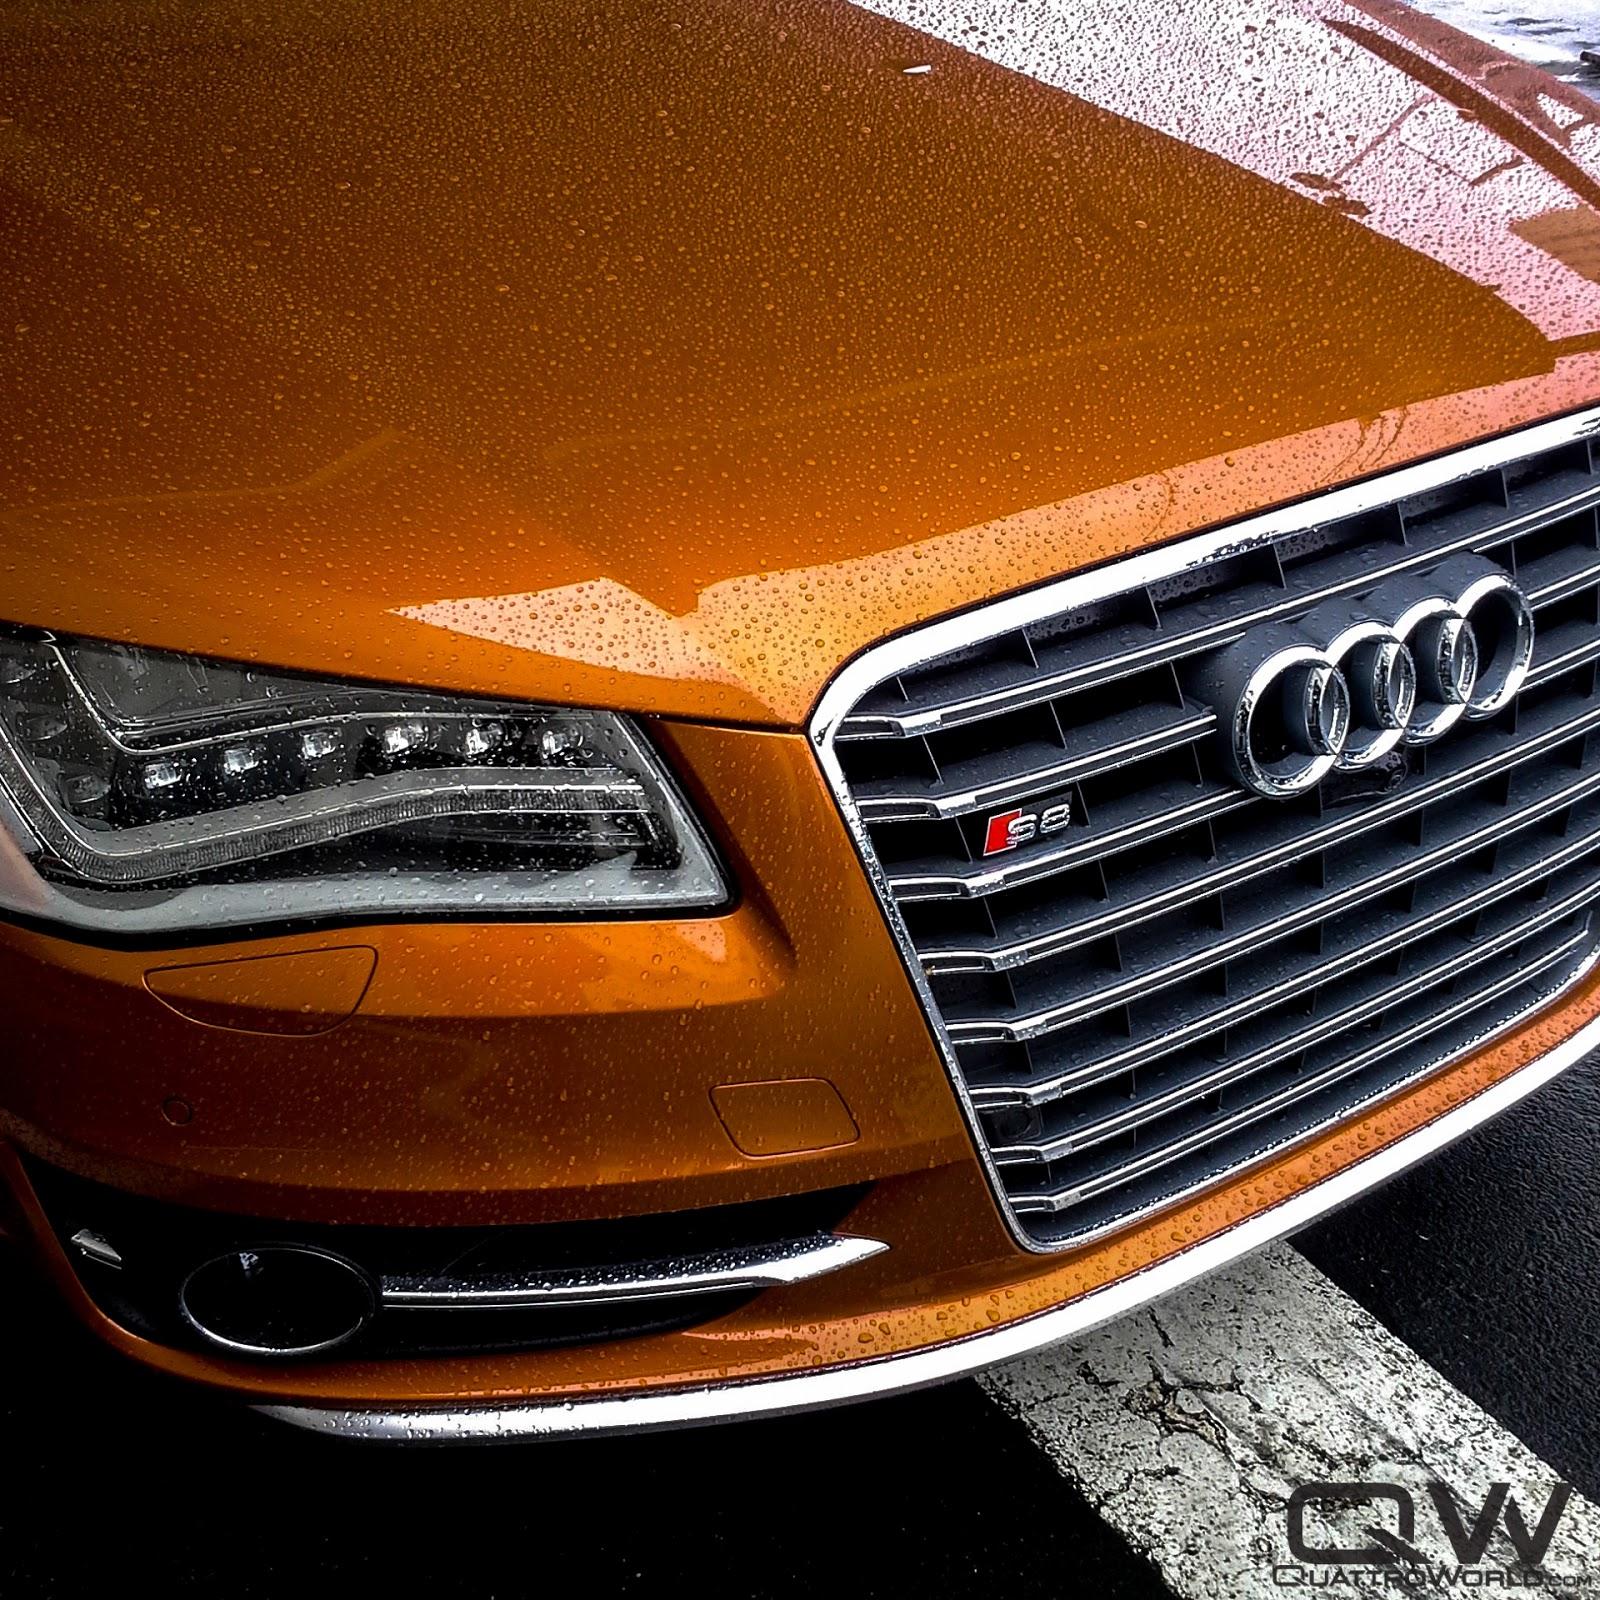 Audi+S8+Samoa+Orange+1.jpg